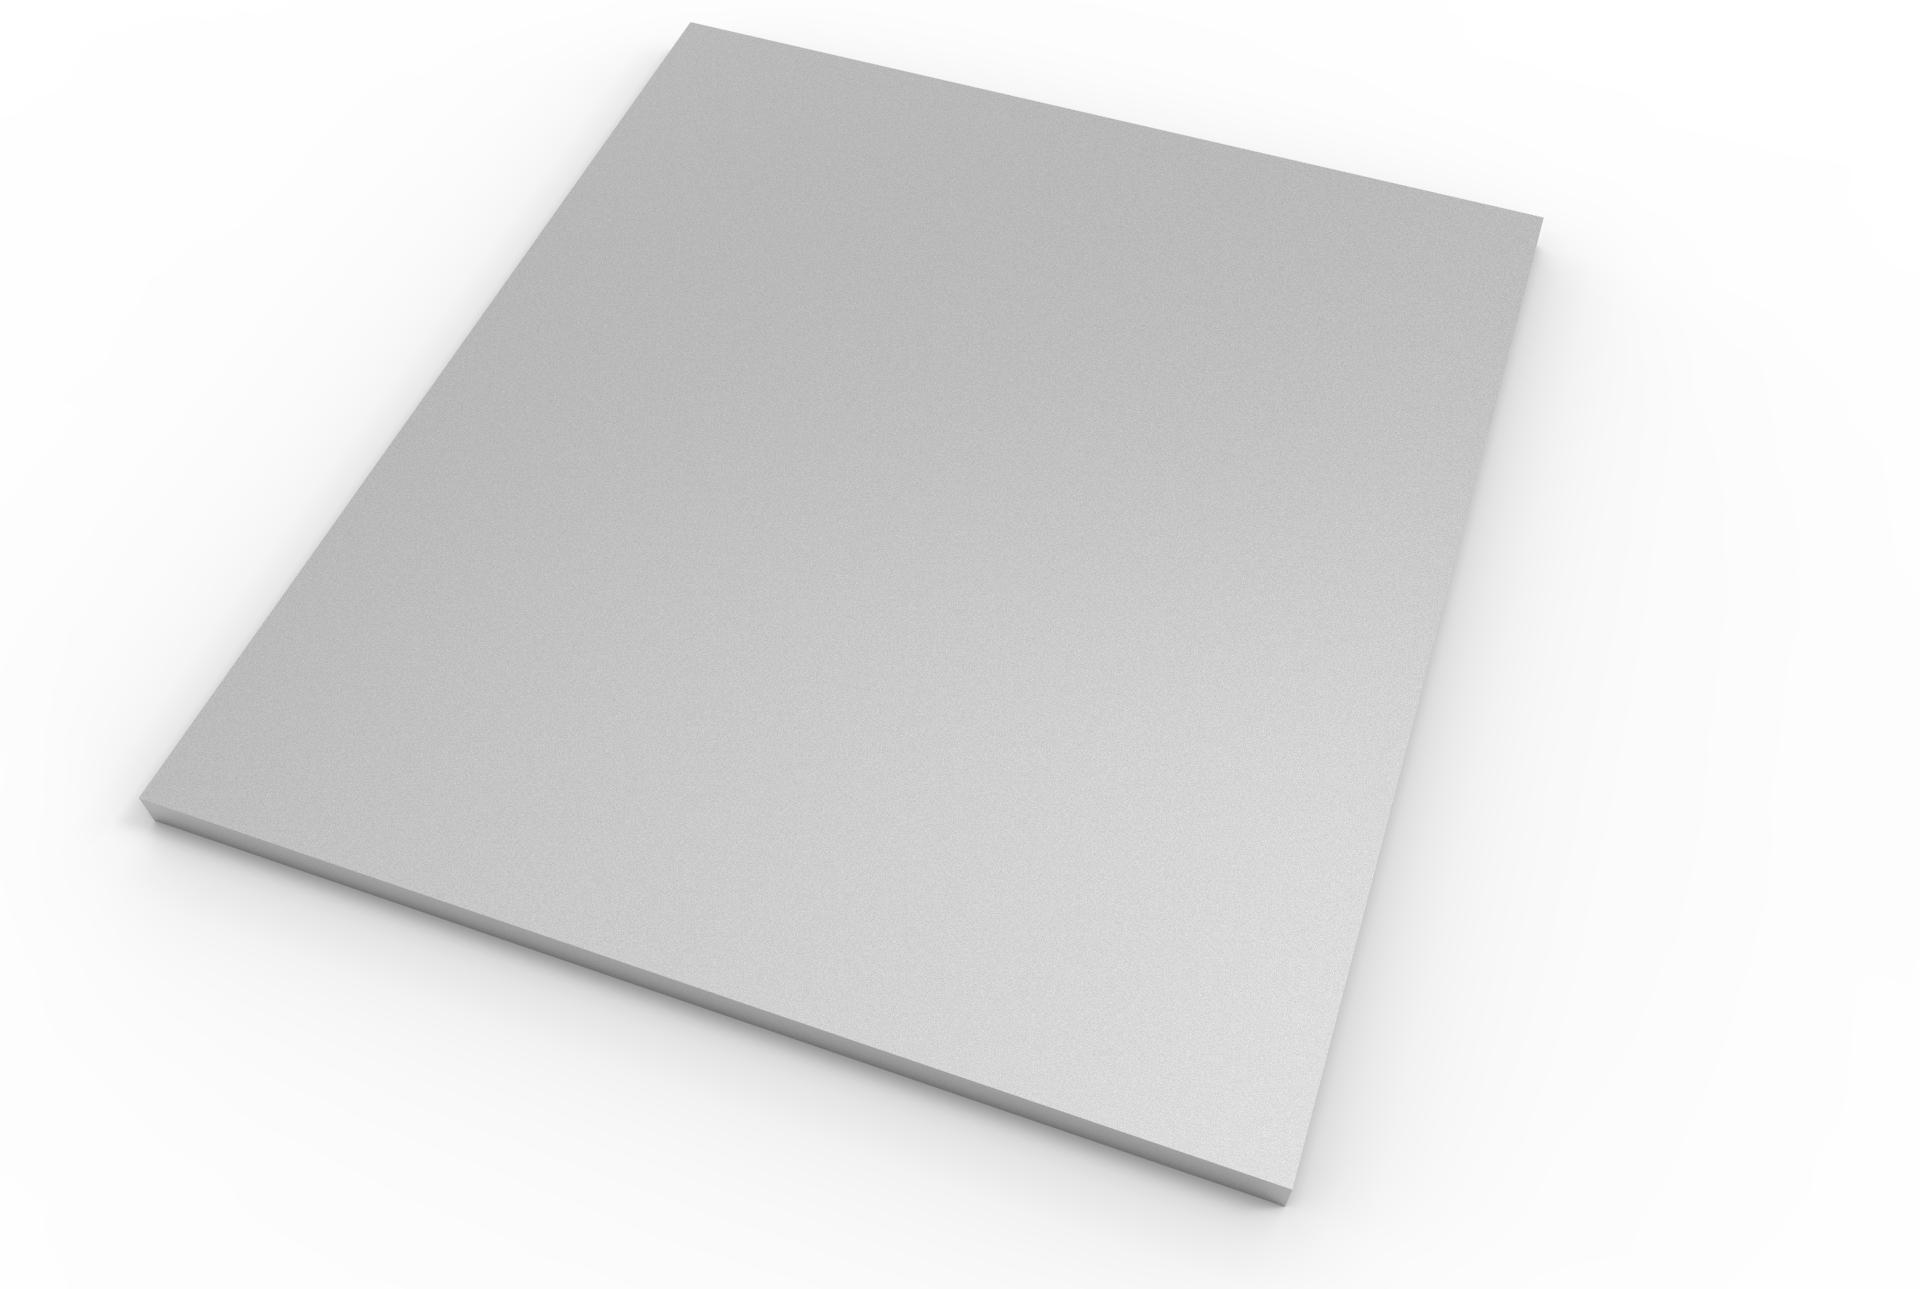 Lanthanated Molybdenum Plate